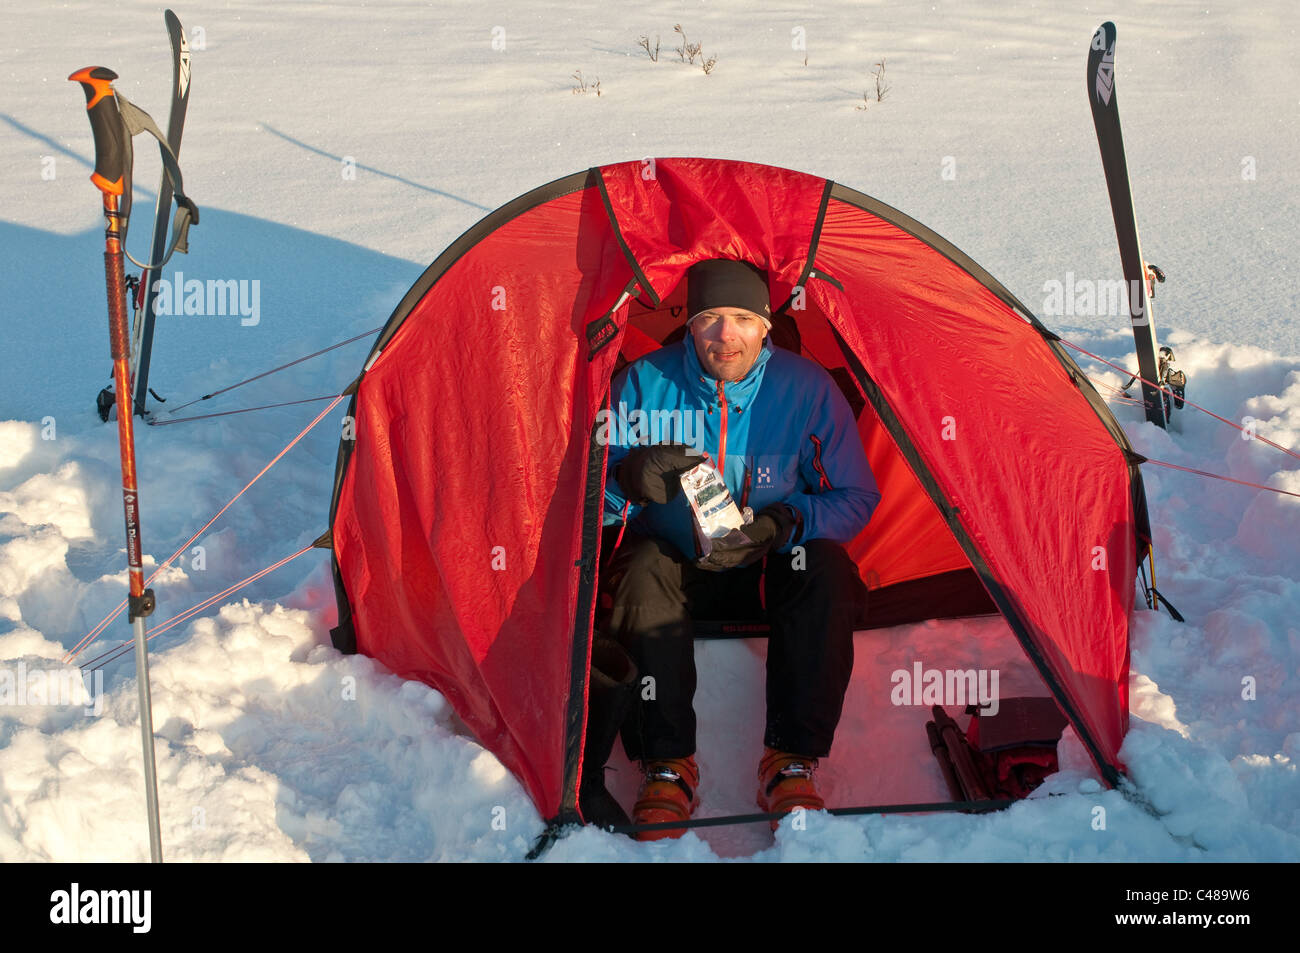 skier ski tourist, resting lapland tent, Sarek Nationalpark, Lappland, Schweden - Stock Image